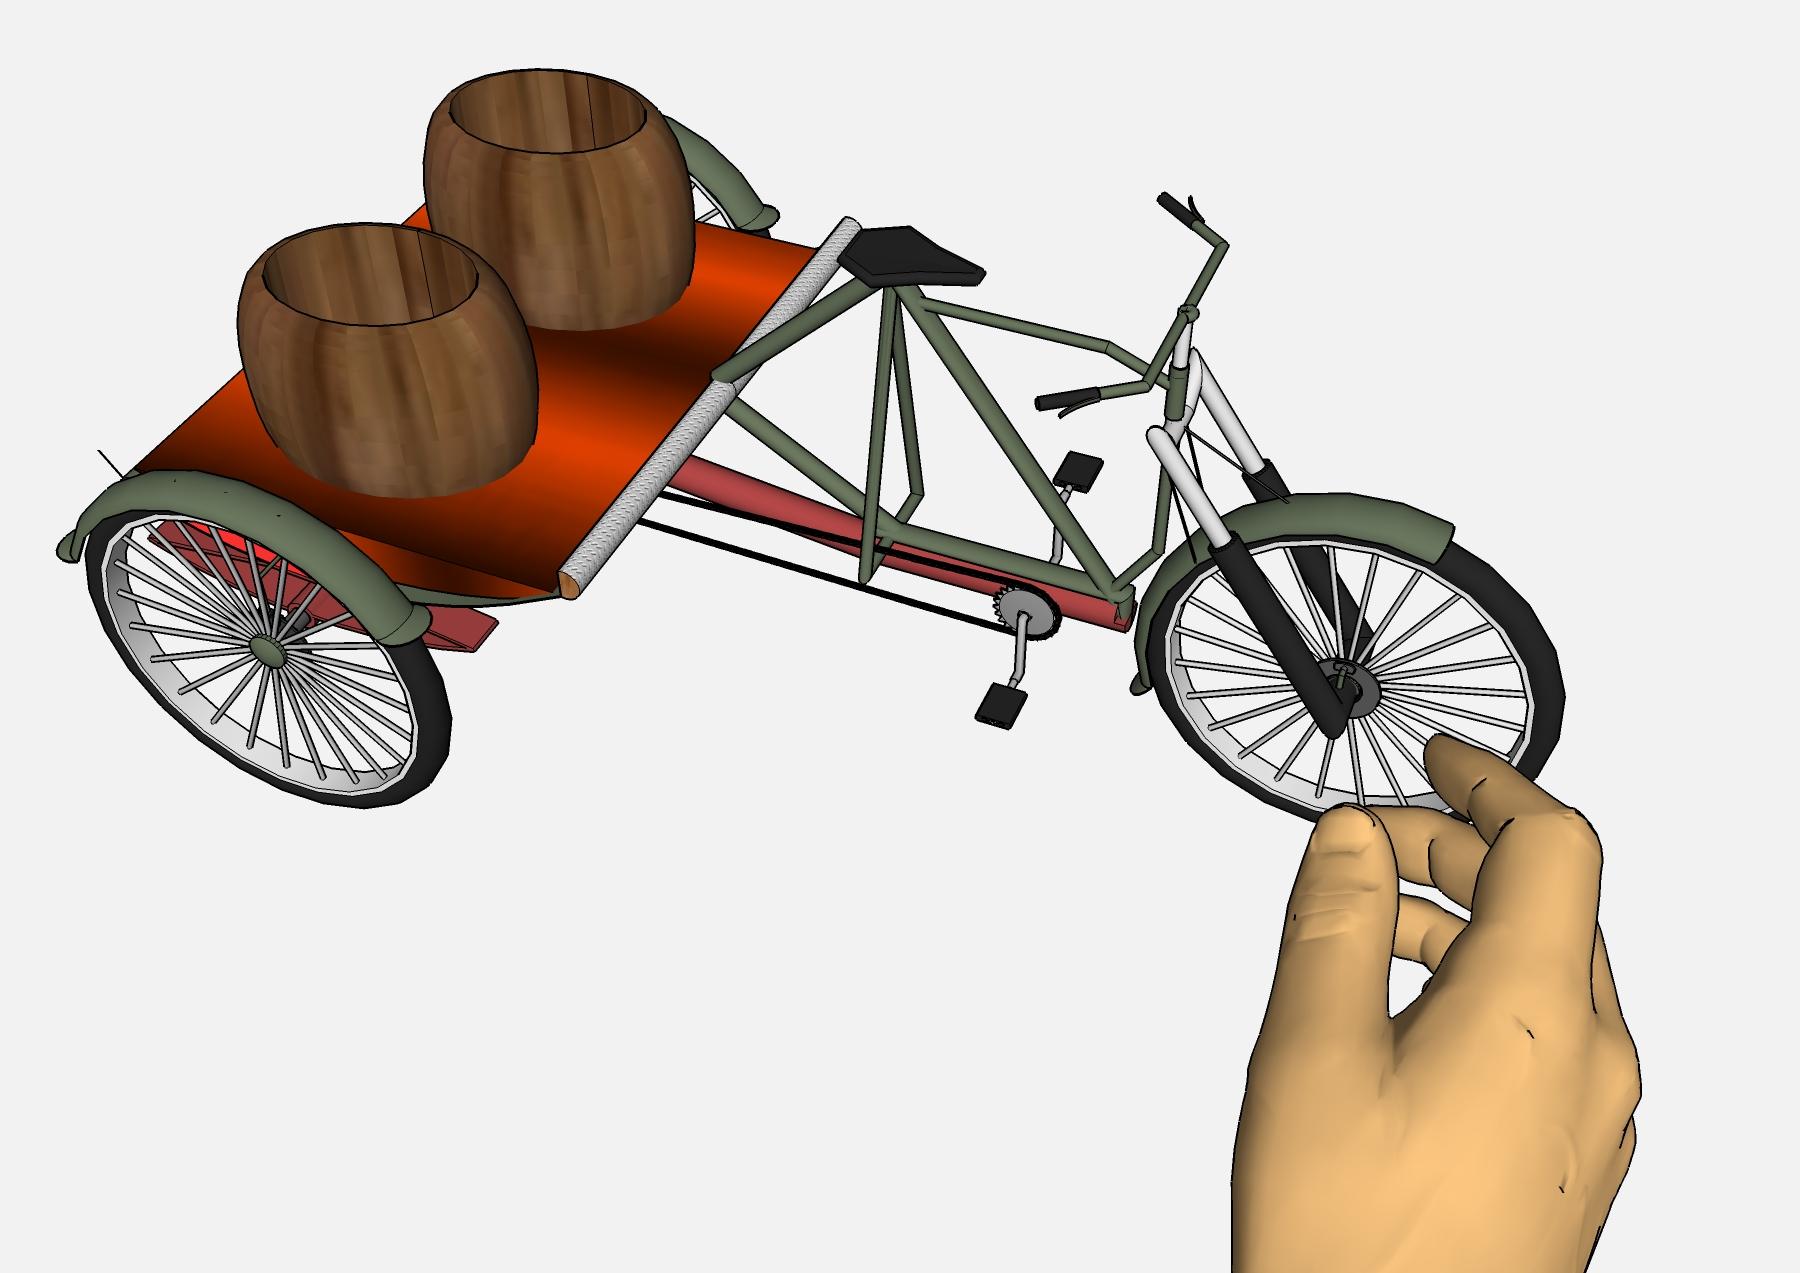 Велорикша чертежи